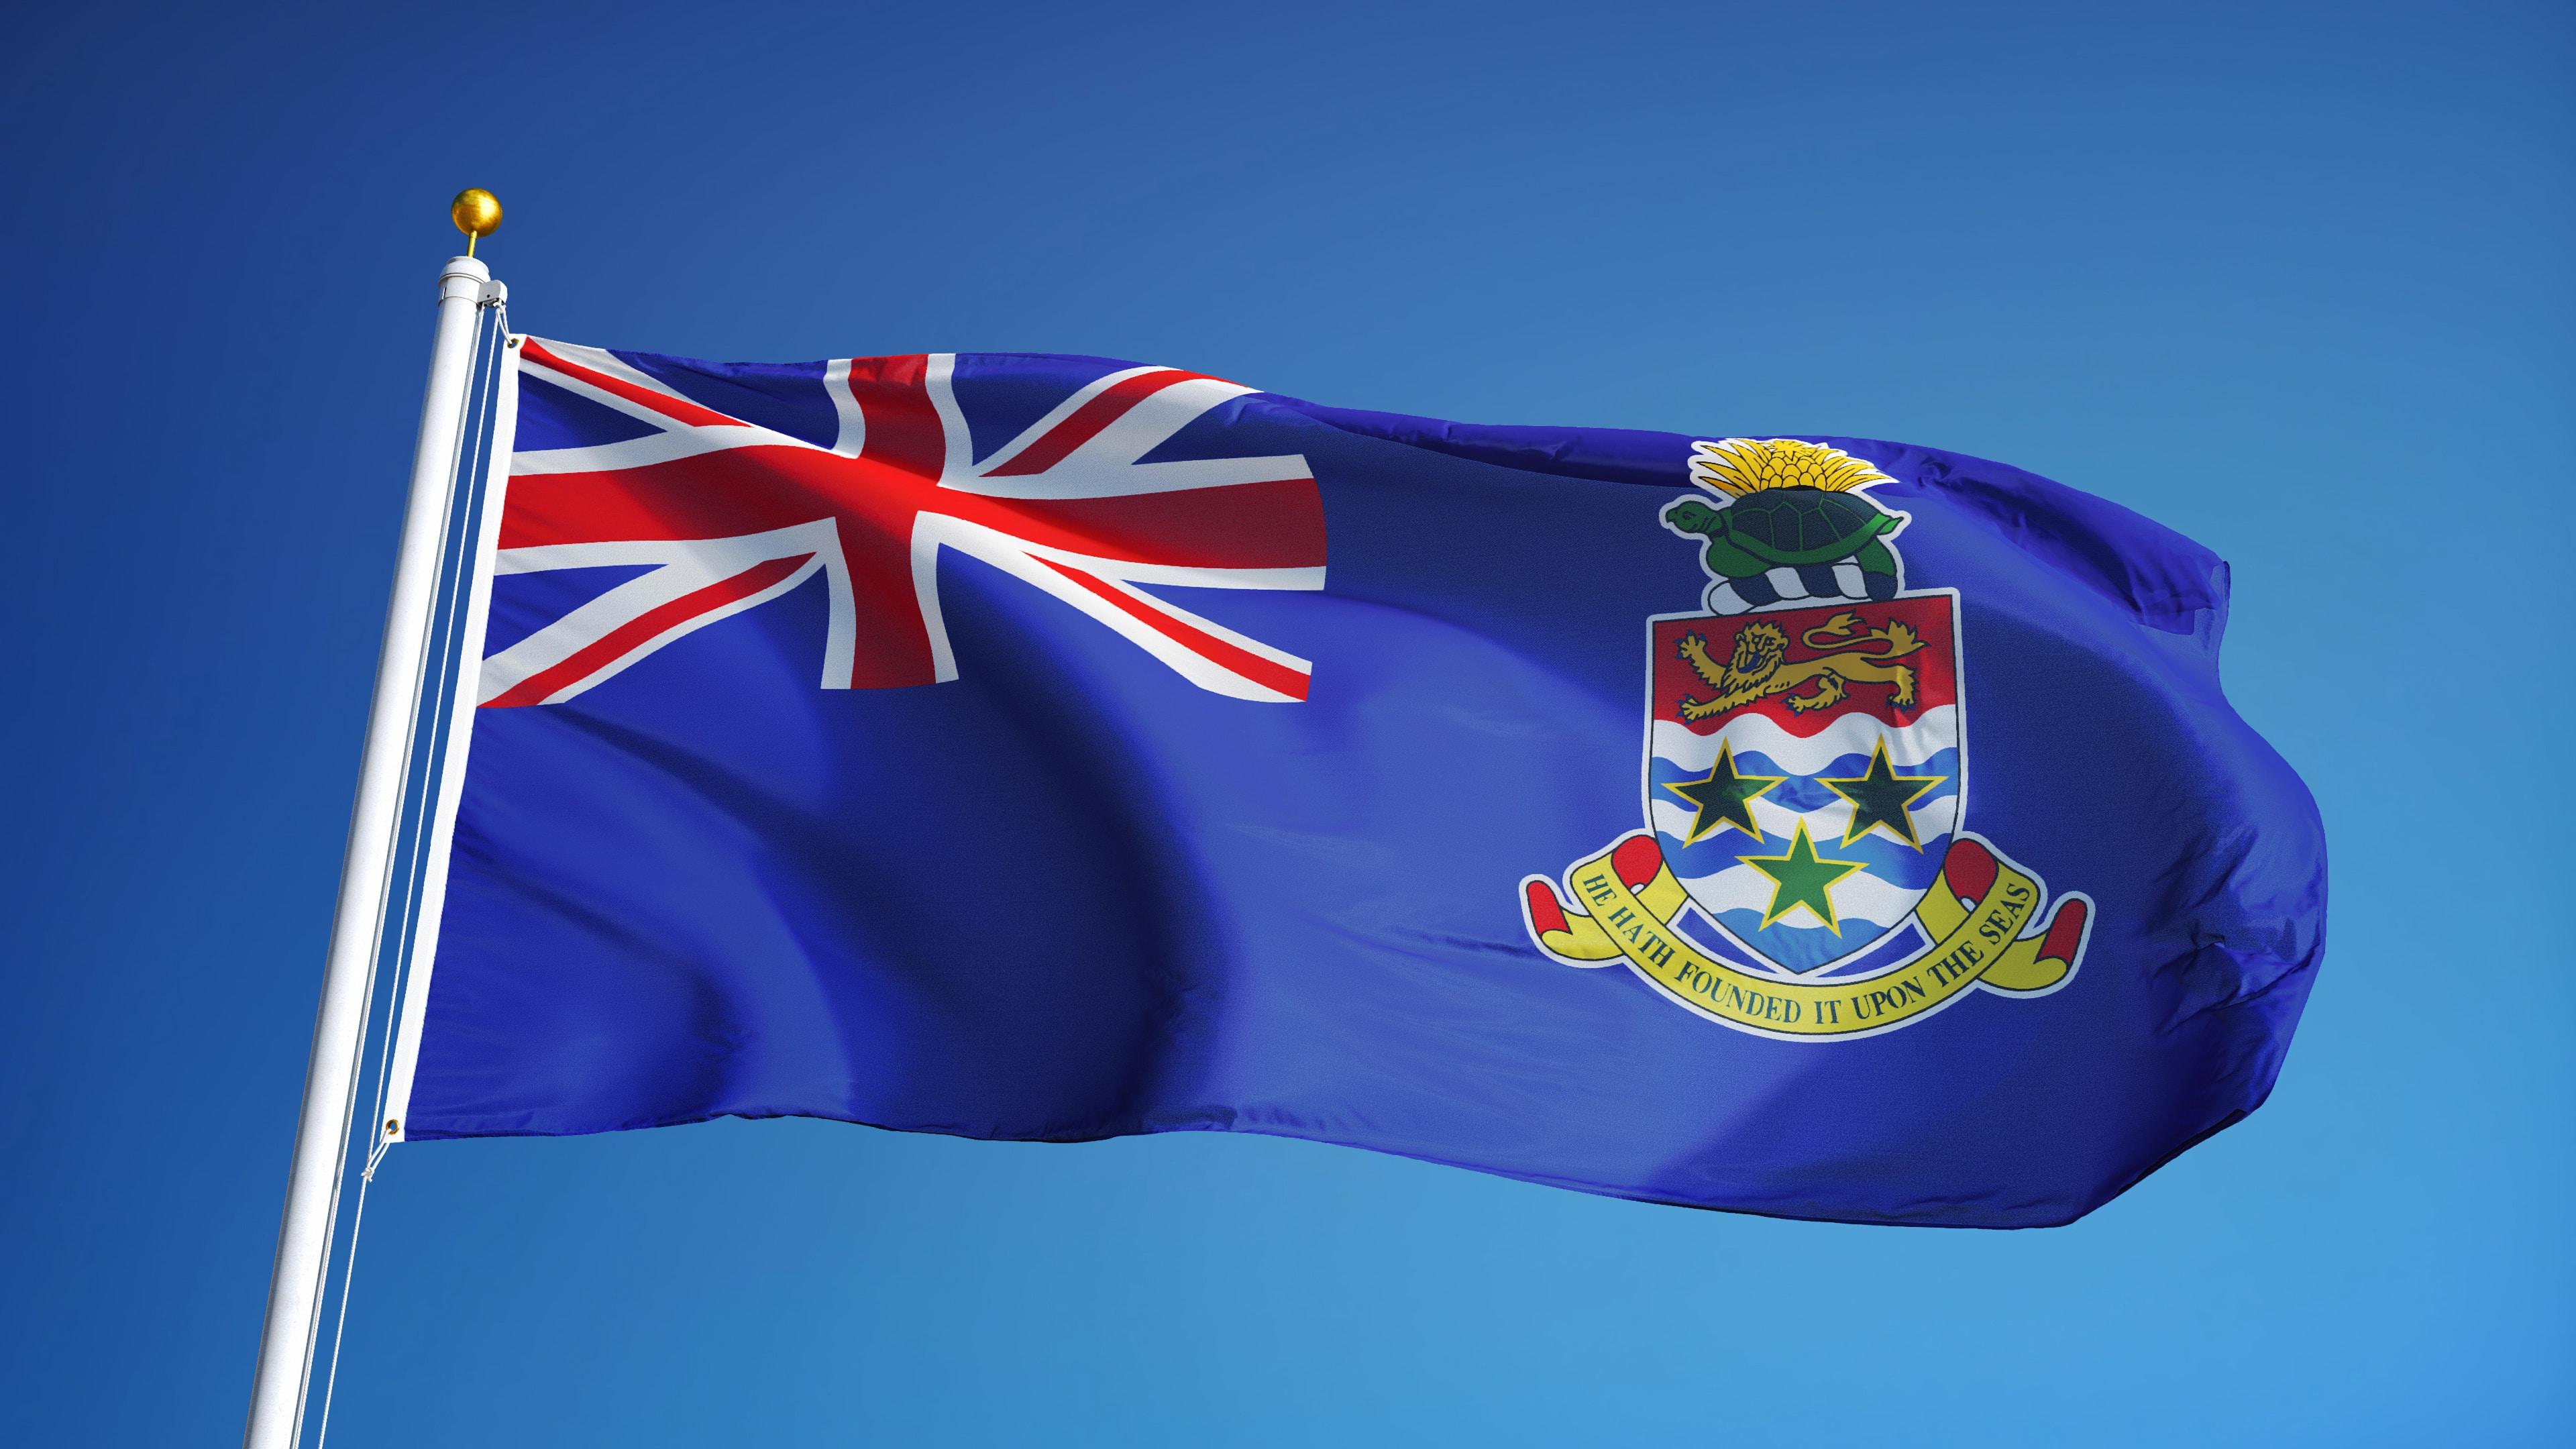 Cayman Islands flag waving against clean blue sky, close up,